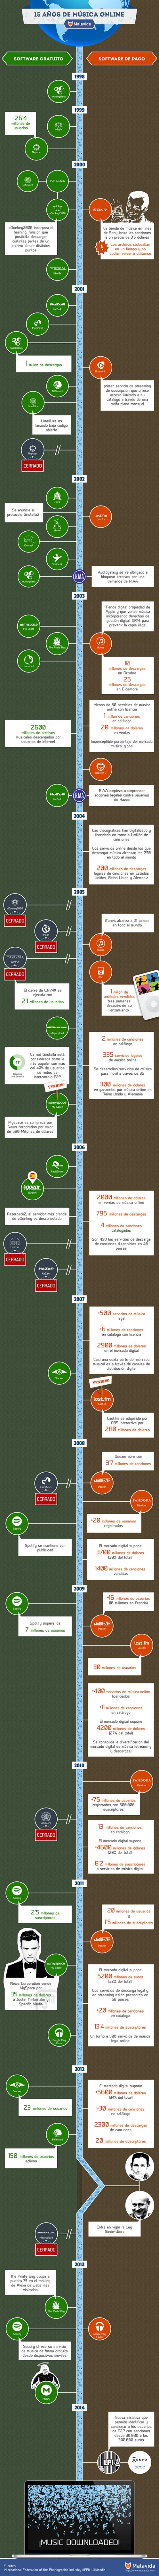 musica-online-infografia